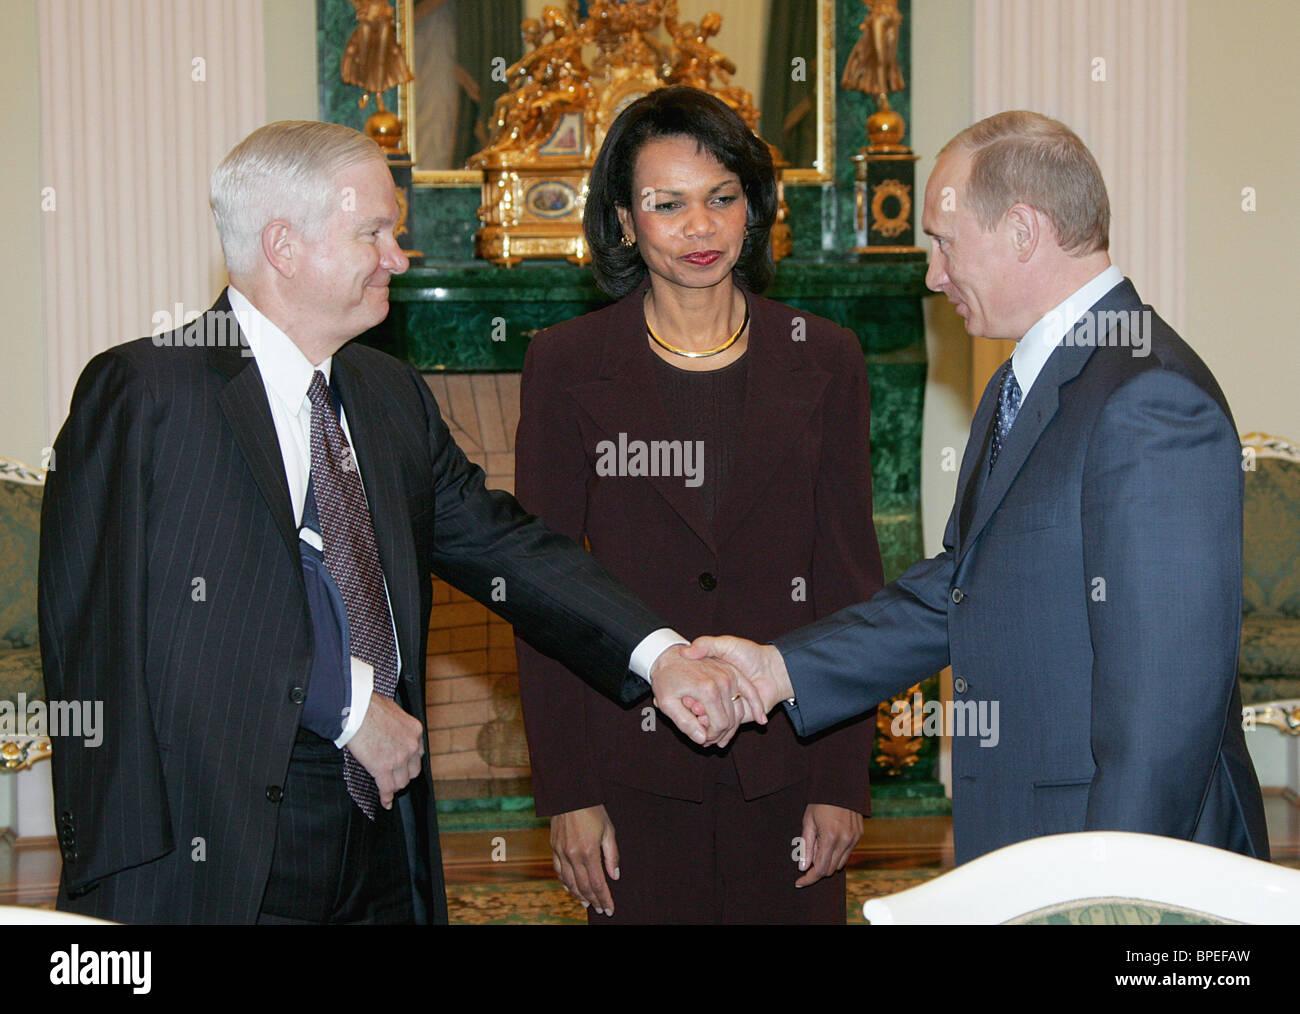 Vladimir Putin meets with senior US officials - Stock Image